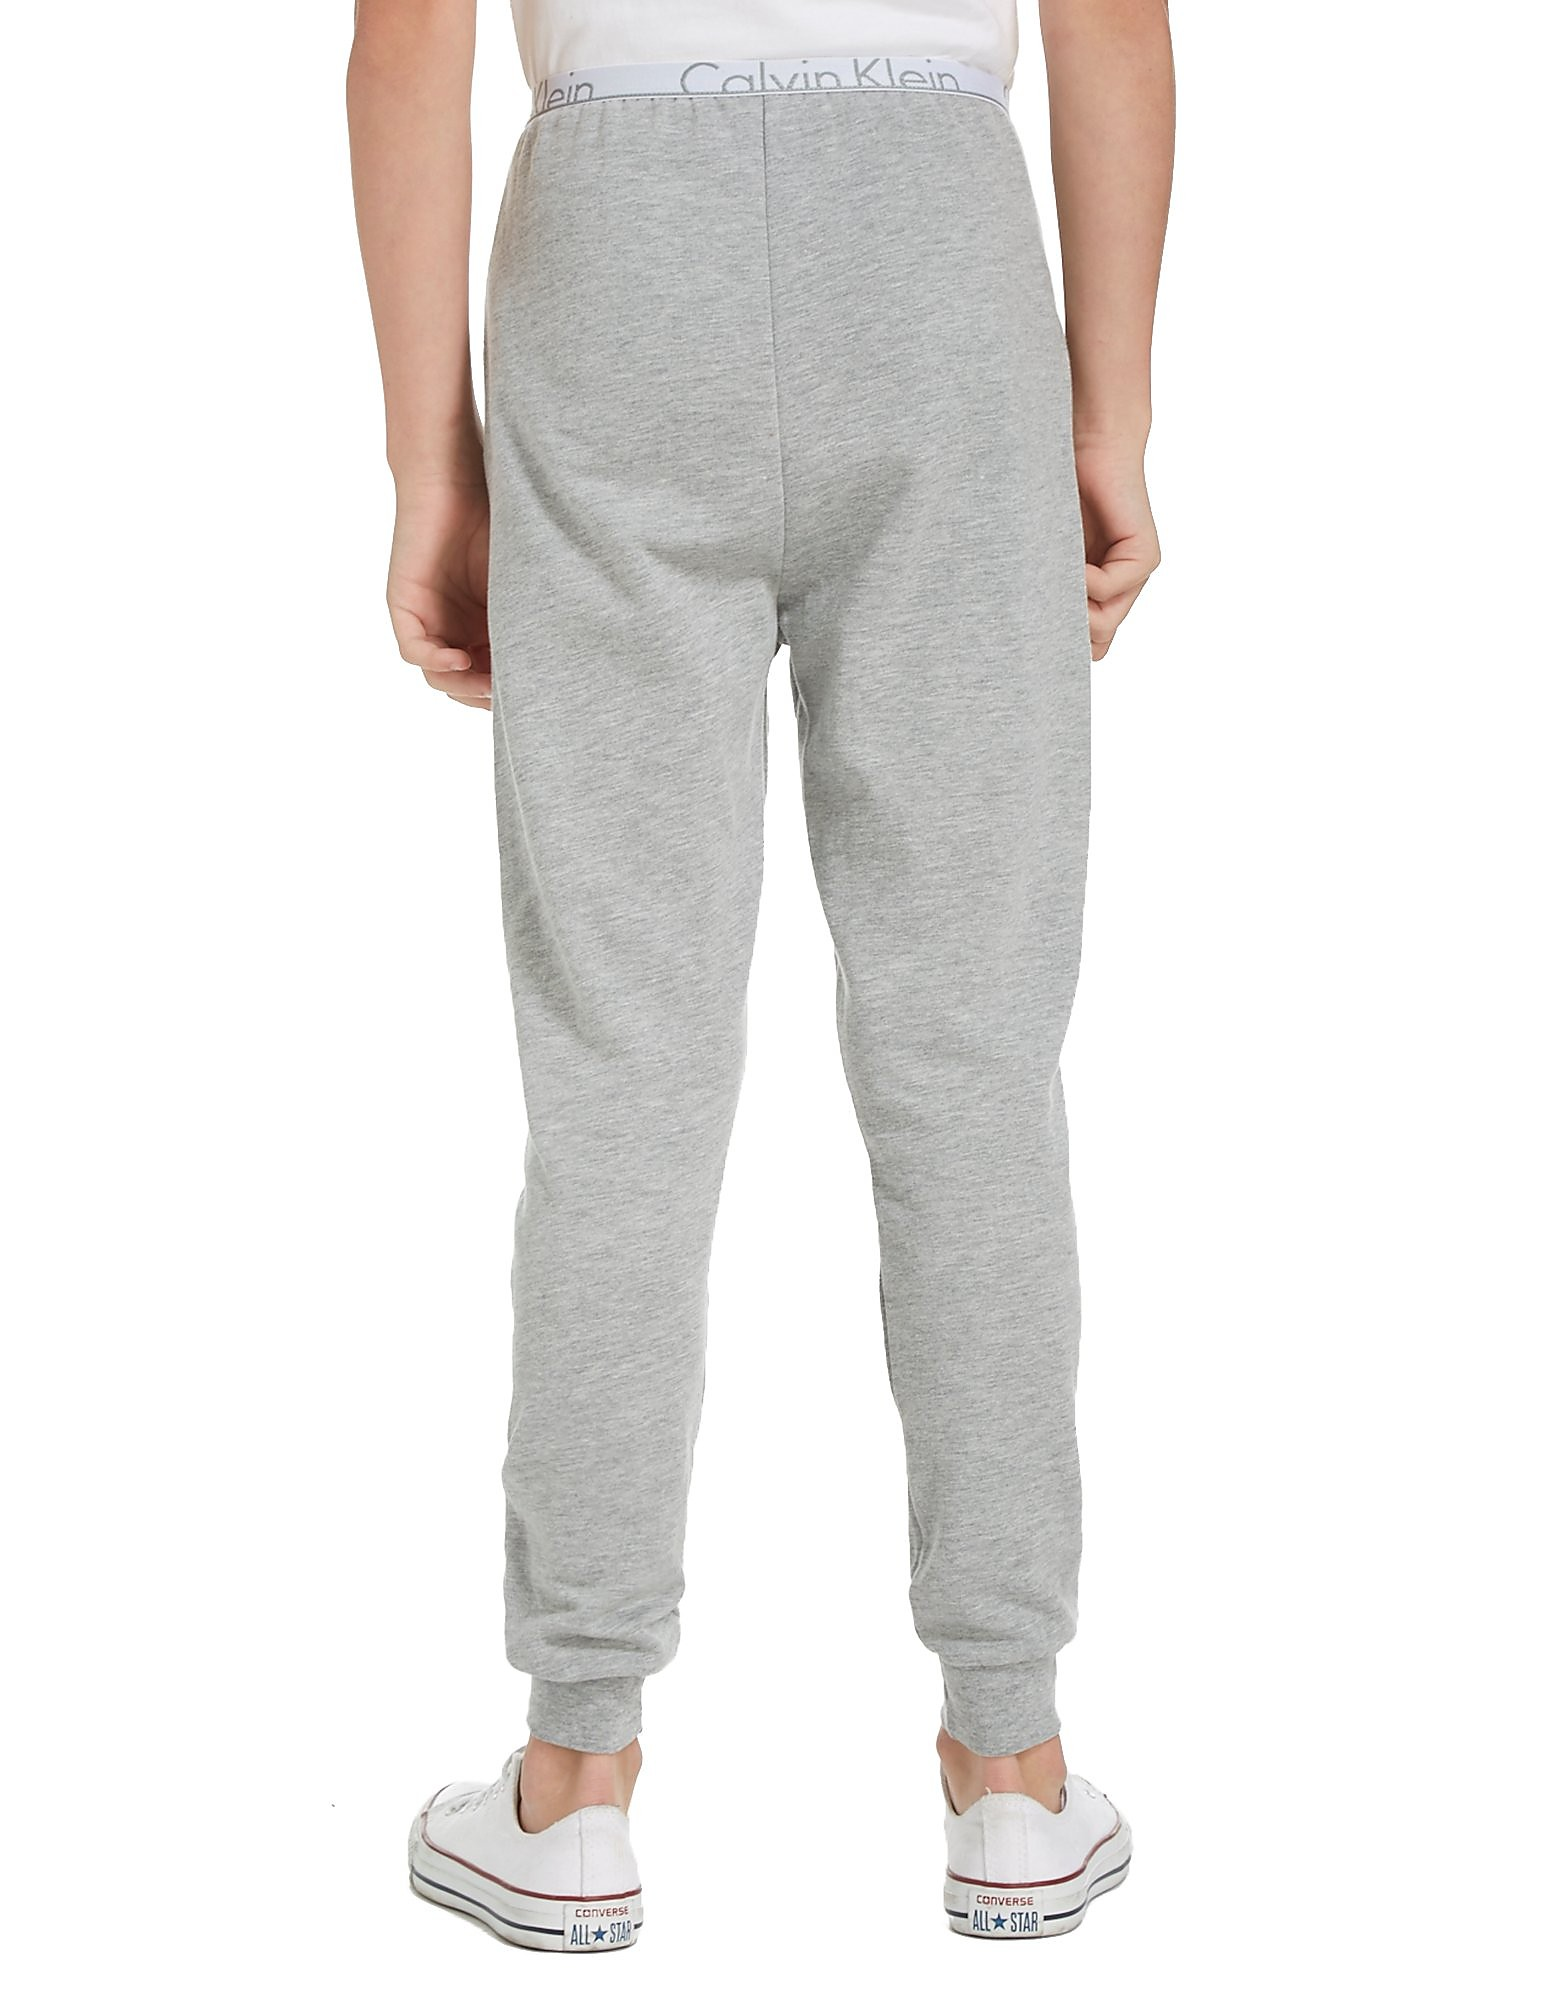 Calvin Klein Tape Track Pants Junior